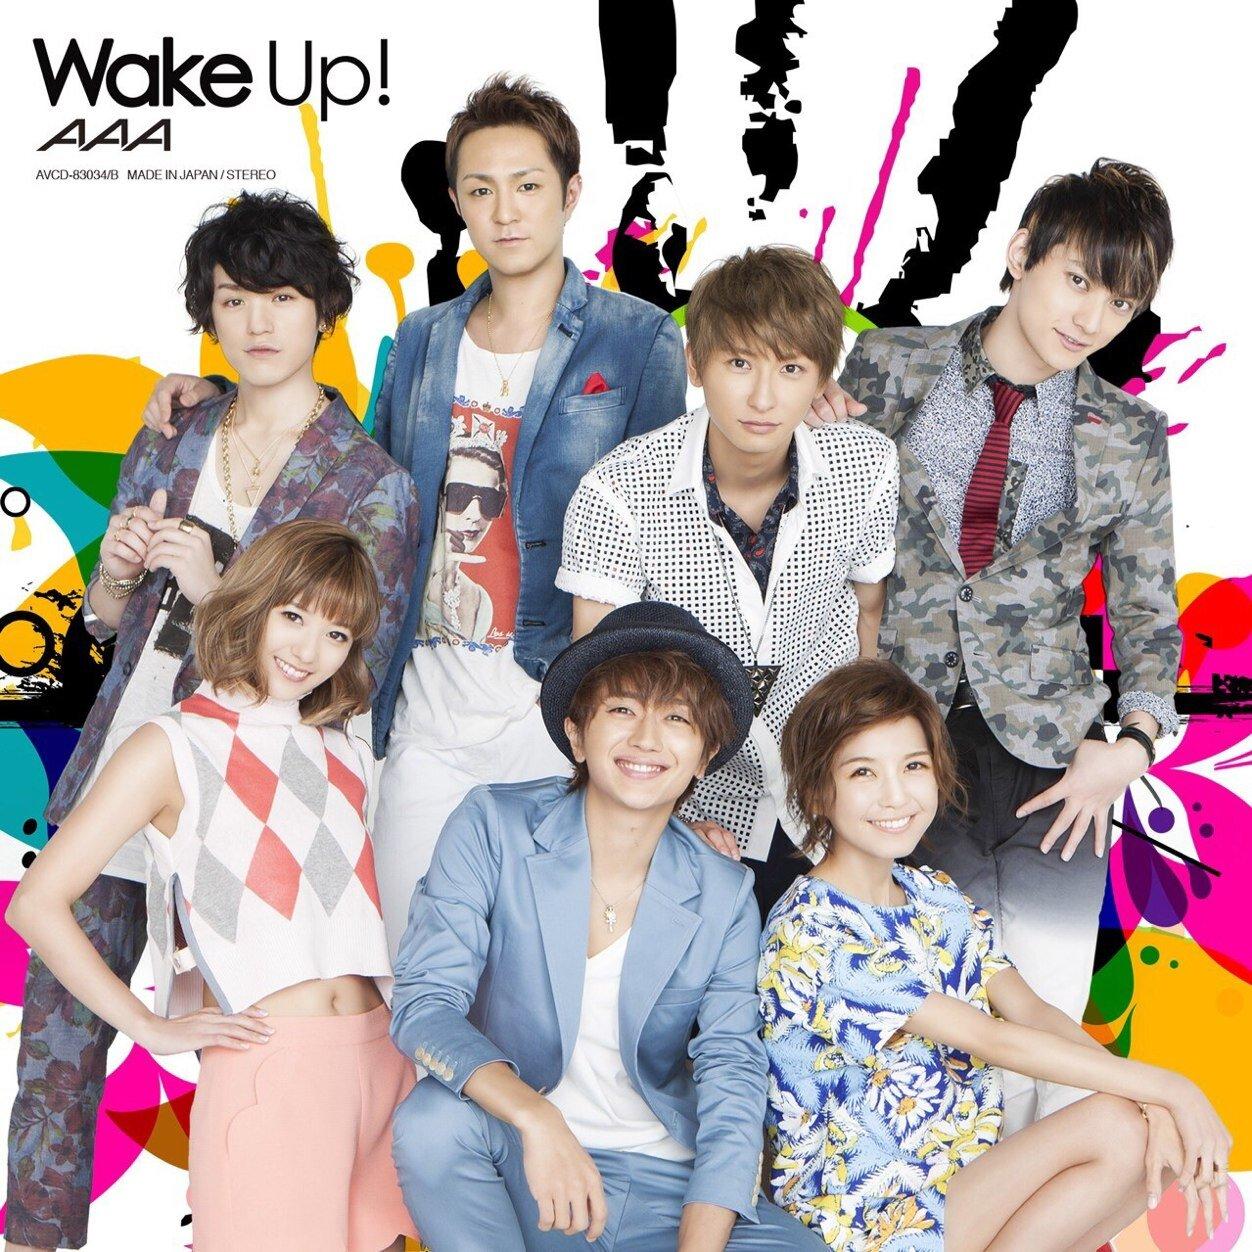 20170501.1548.01 AAA - Wake up! cover 1.jpg